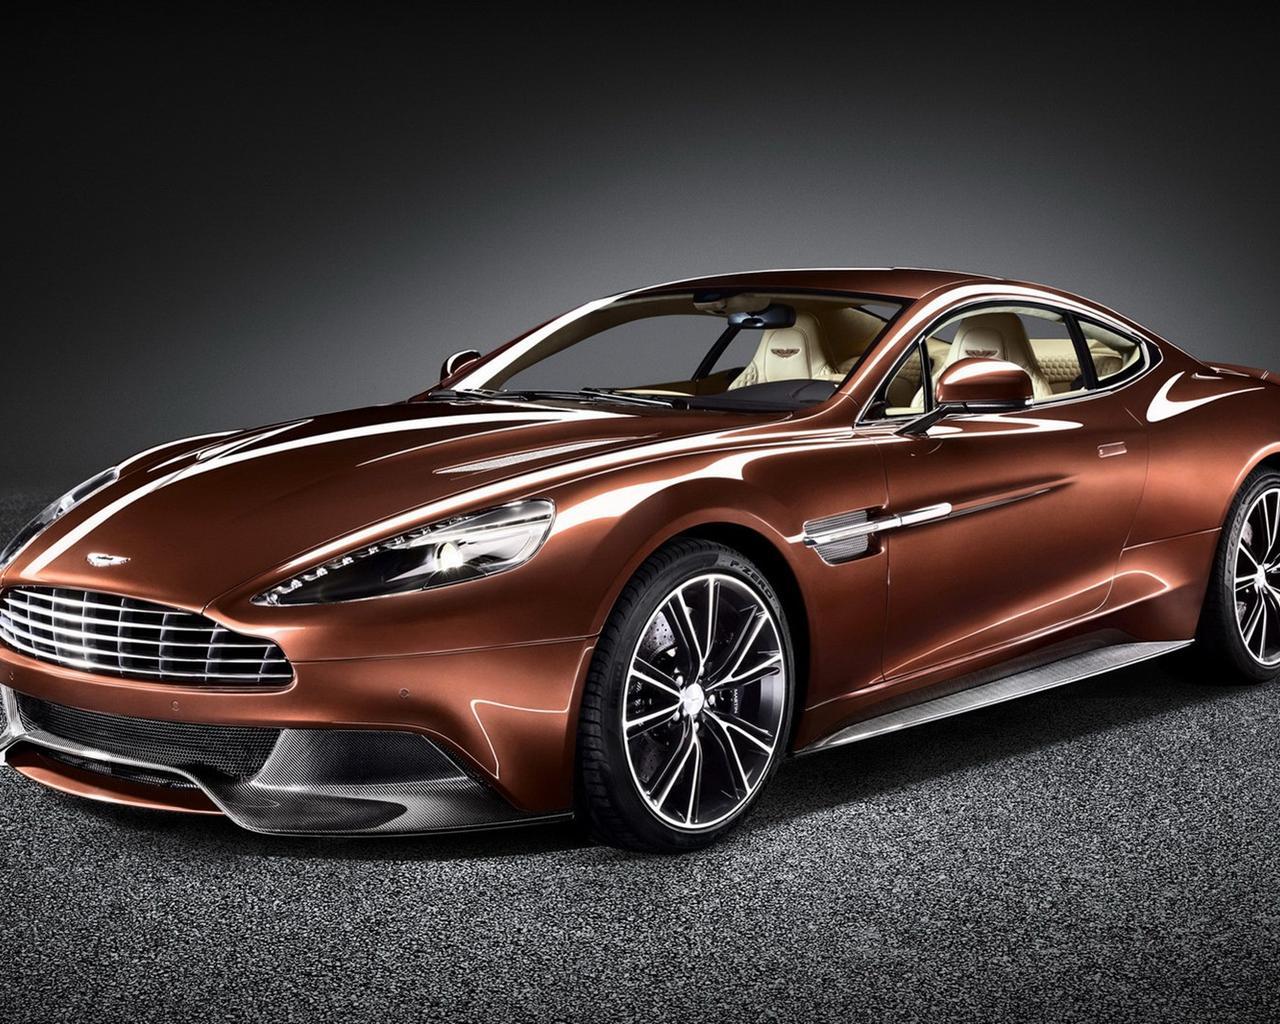 Aston Martin Vanquish Awesome Brown Car Wallpaper Download 1280x1024